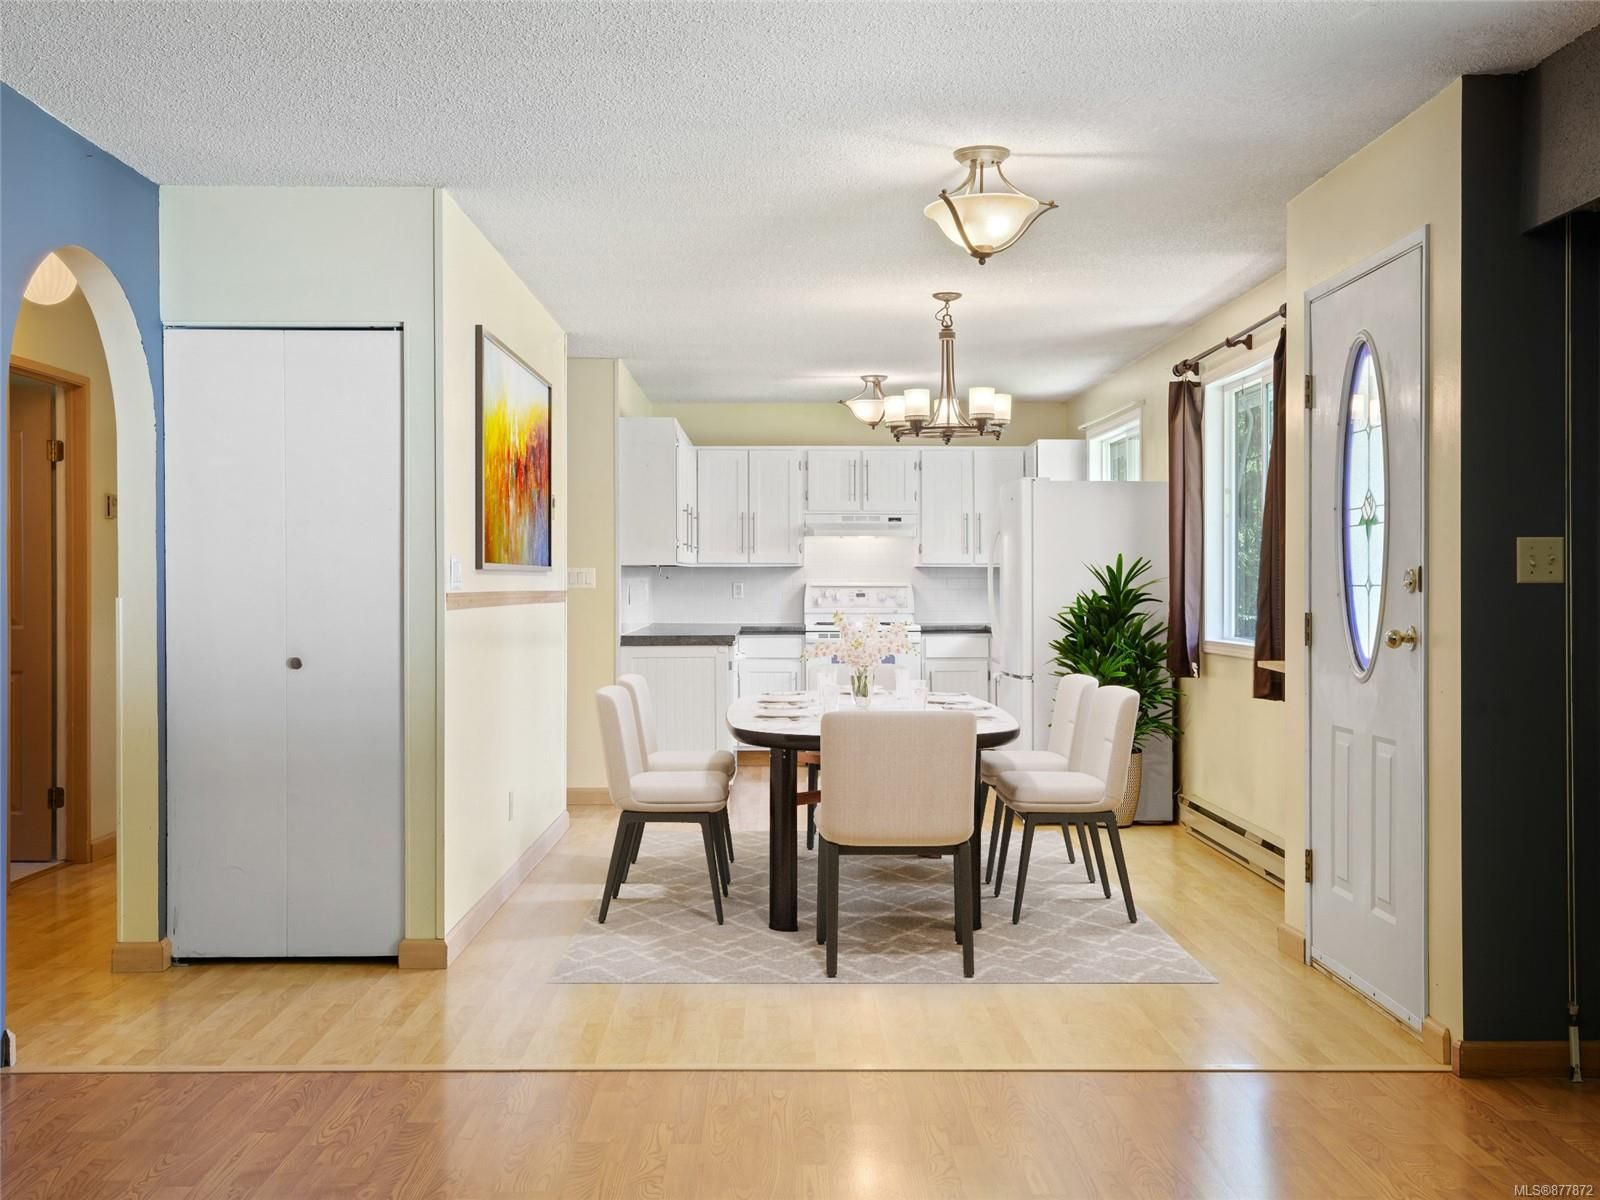 Photo 3: Photos: 7865 Wardrop Rd in : PA Port Alberni House for sale (Port Alberni)  : MLS®# 877872